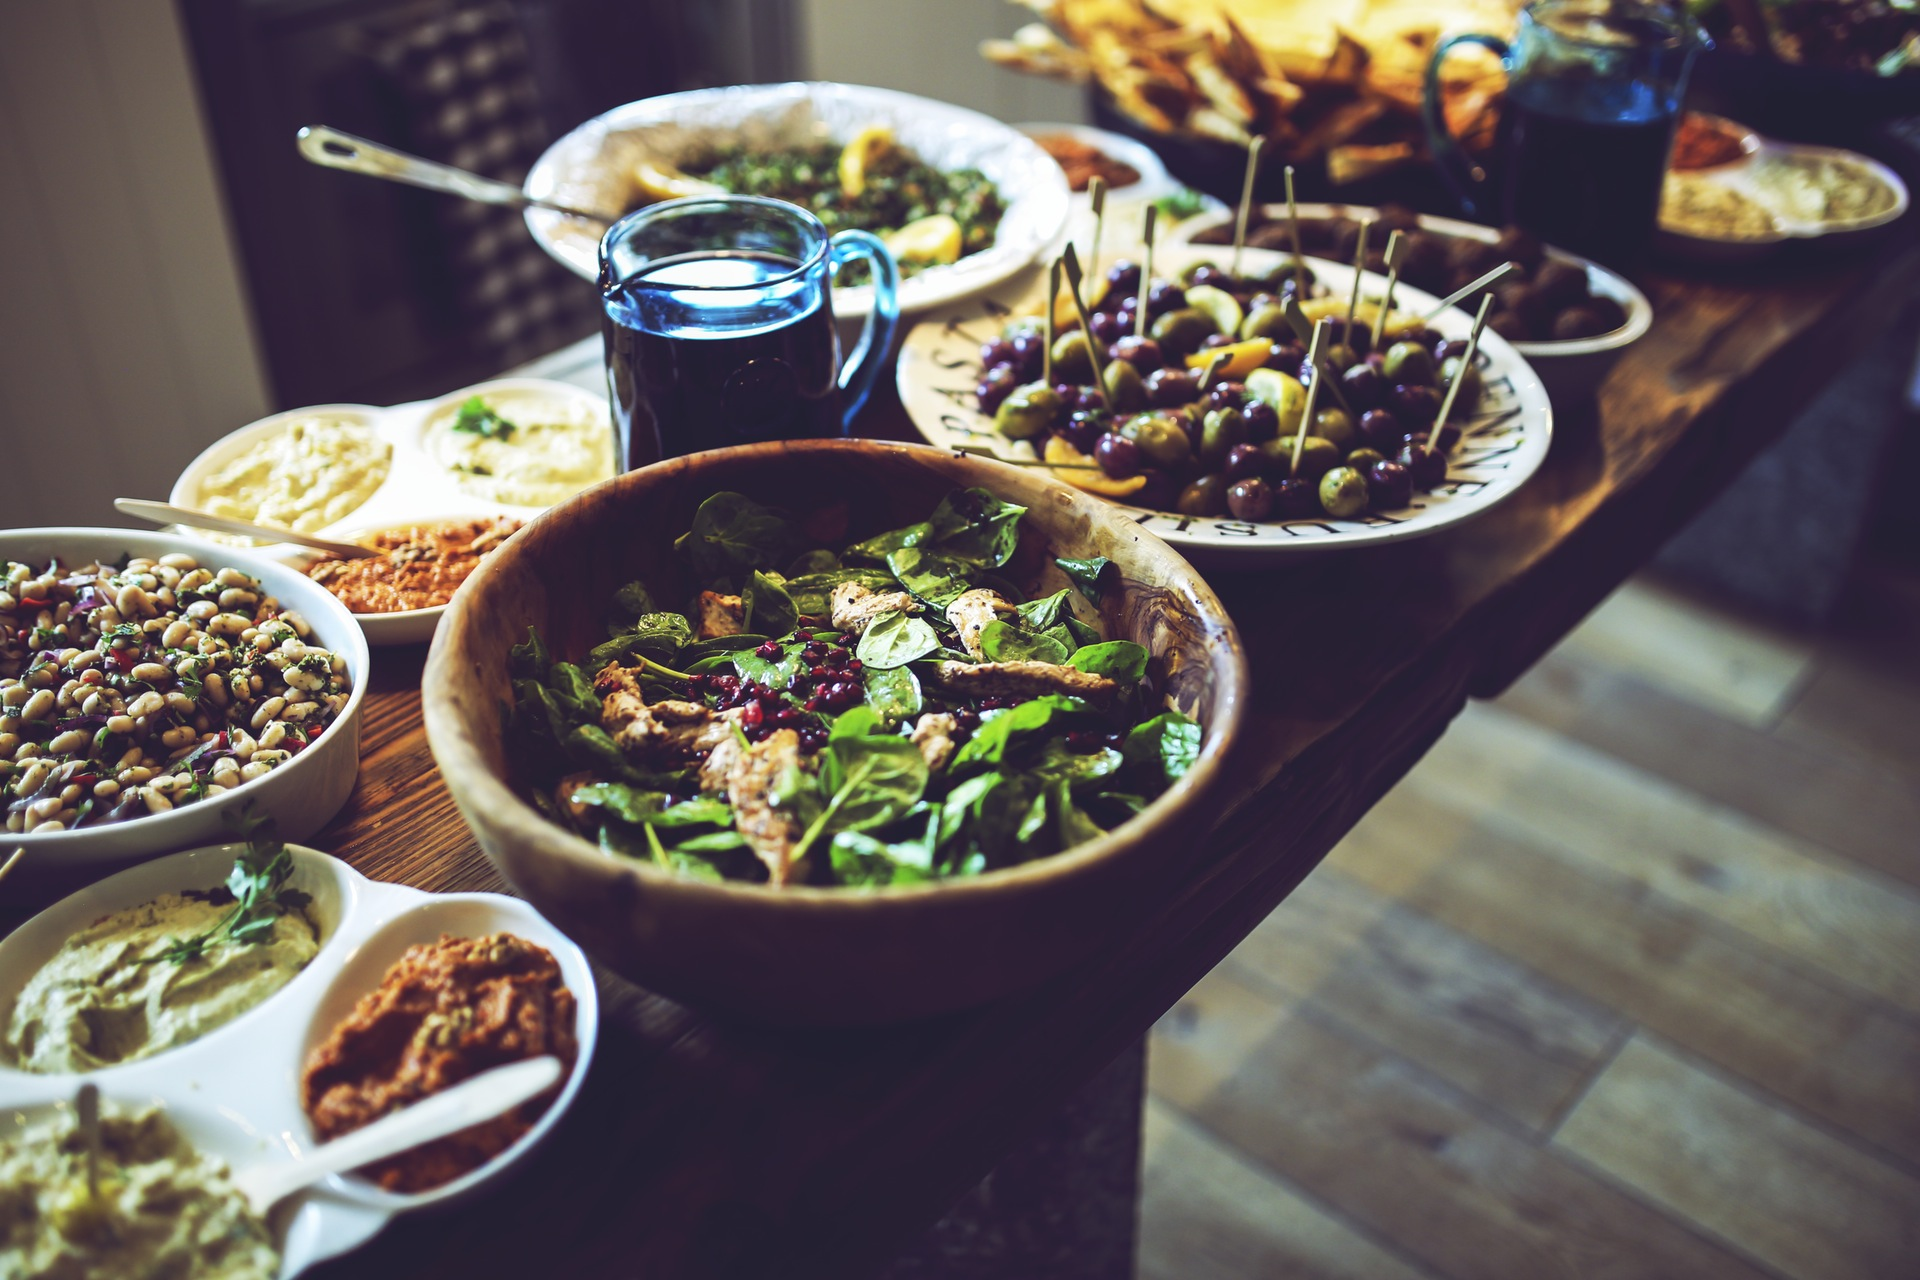 Essen, Salat, Gemüse, gesund, Küche, sehr lecker - Wallpaper HD - Prof.-falken.com